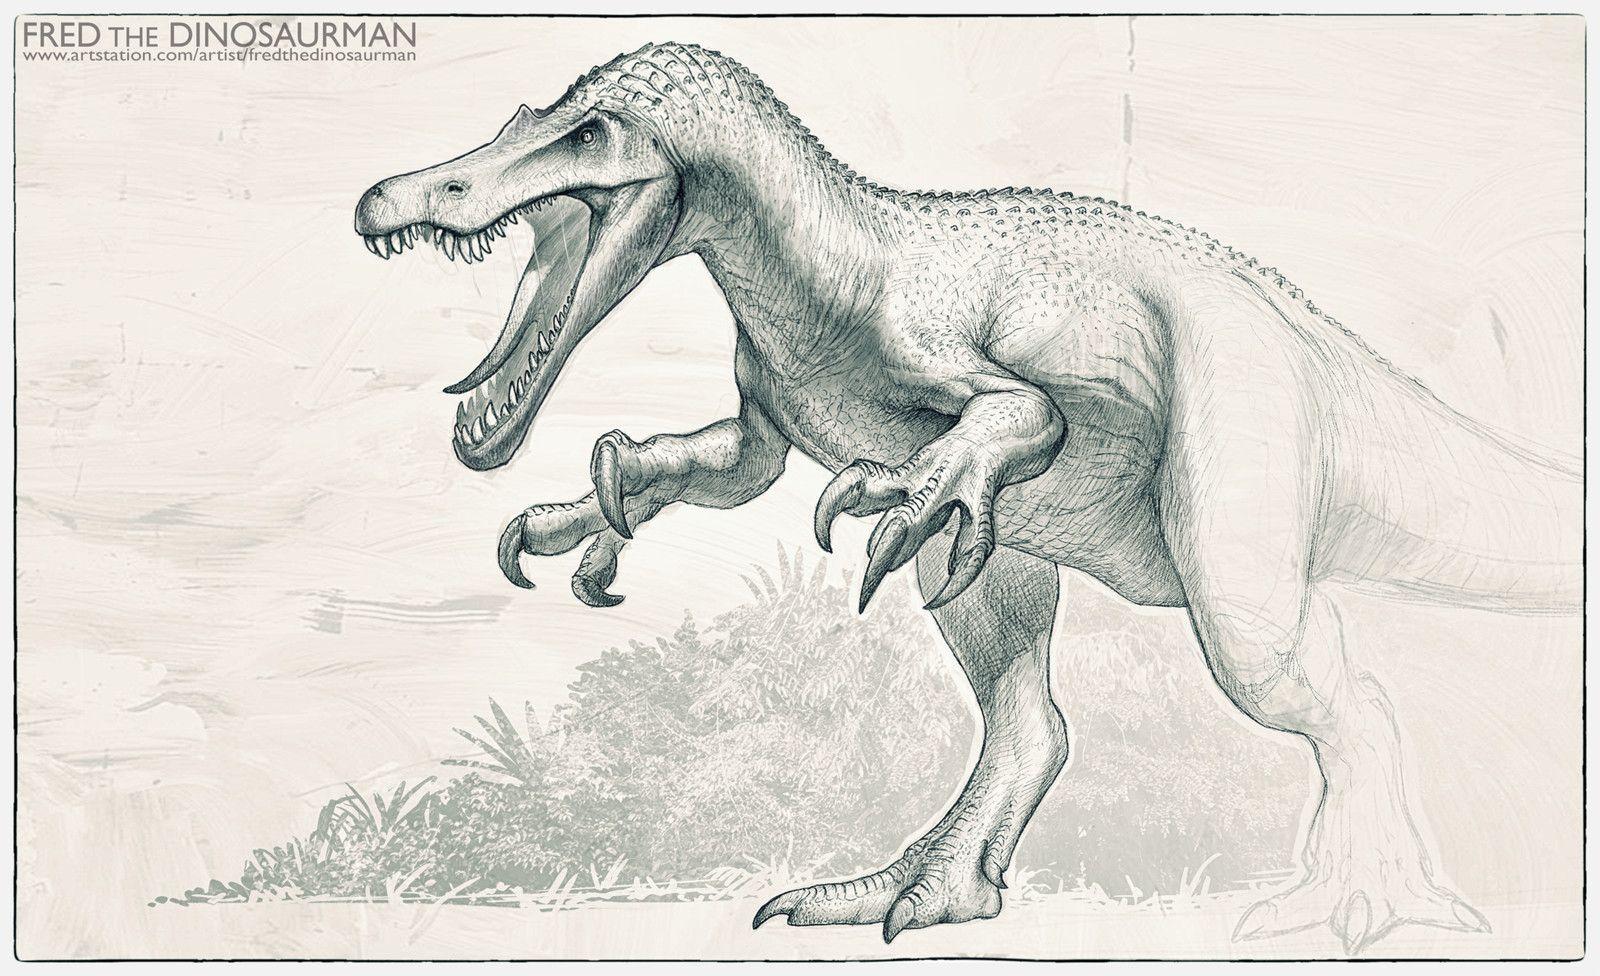 Baryonyx Jp Stylized Fred Wierum On Artstation At Https Www Artstation Com Artwork Zqyg0 Dinosaur Pictures Dinosaur Art Jurassic World Dinosaurs